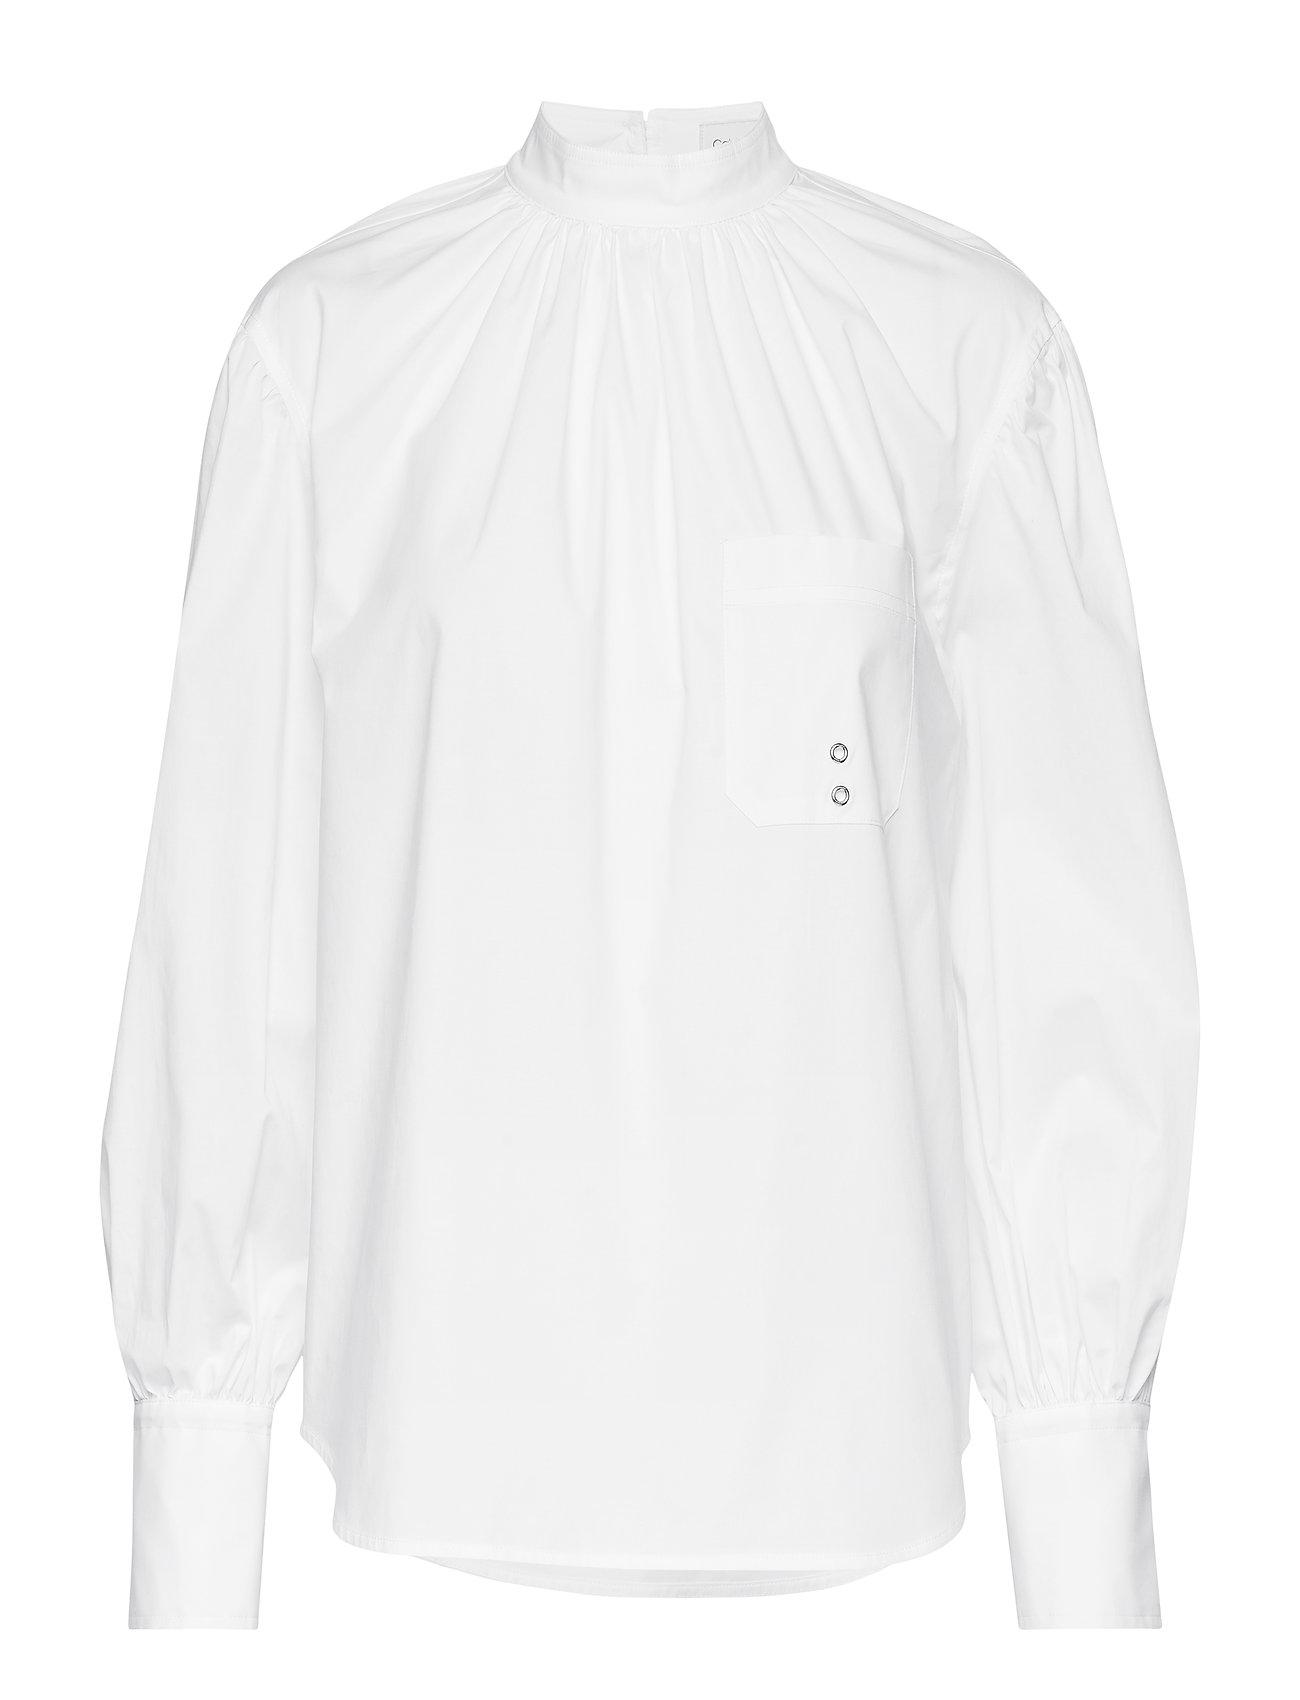 Calvin Klein PKT DETAIL BLOUSE LS - WHITE